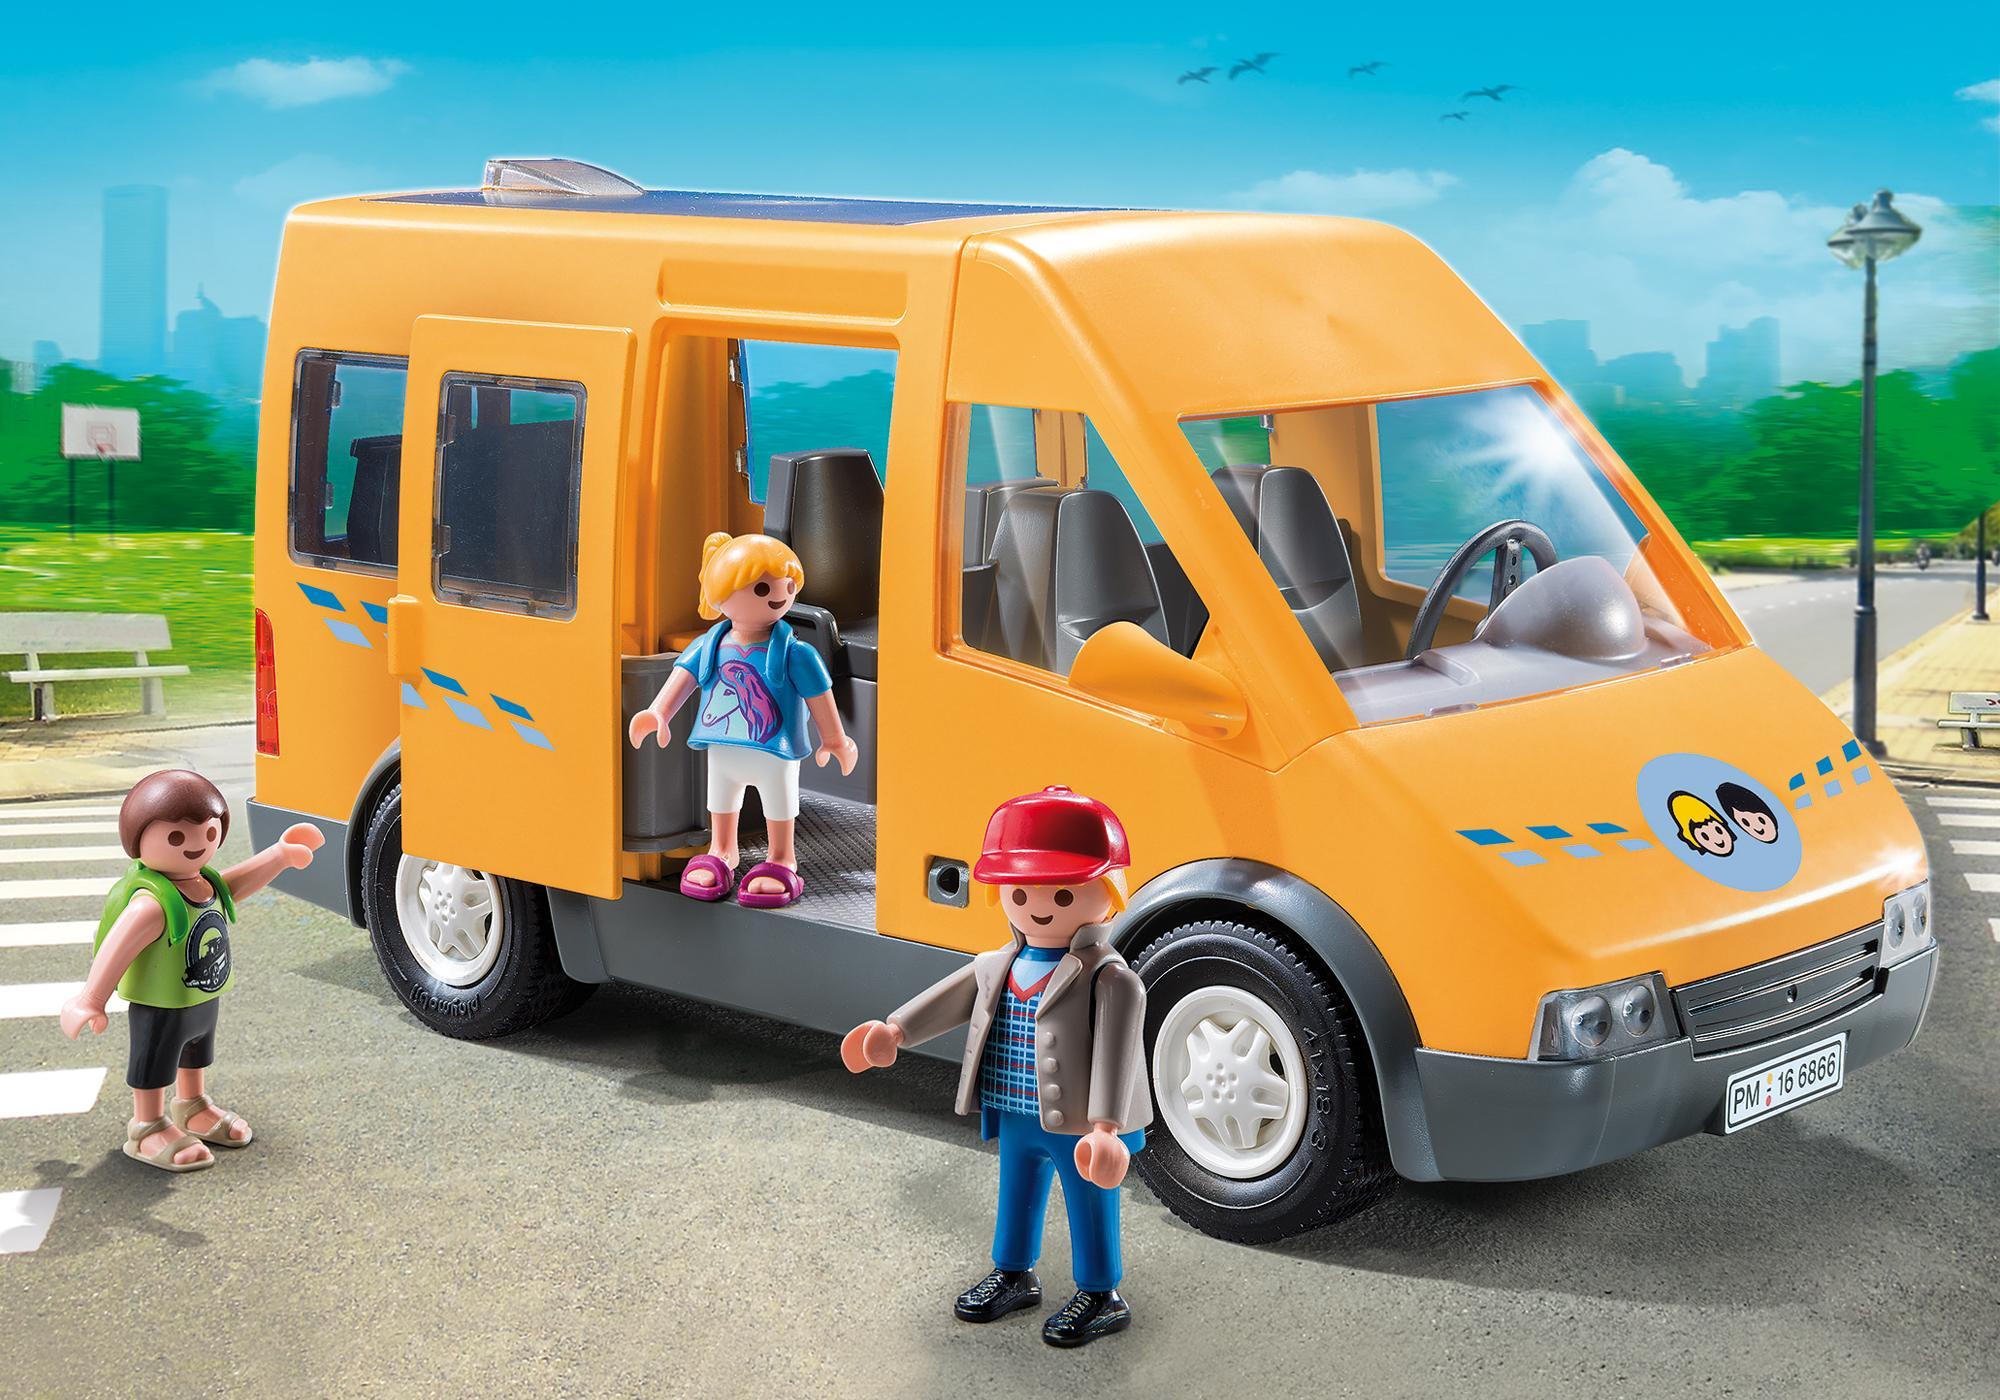 http://media.playmobil.com/i/playmobil/6866_product_detail